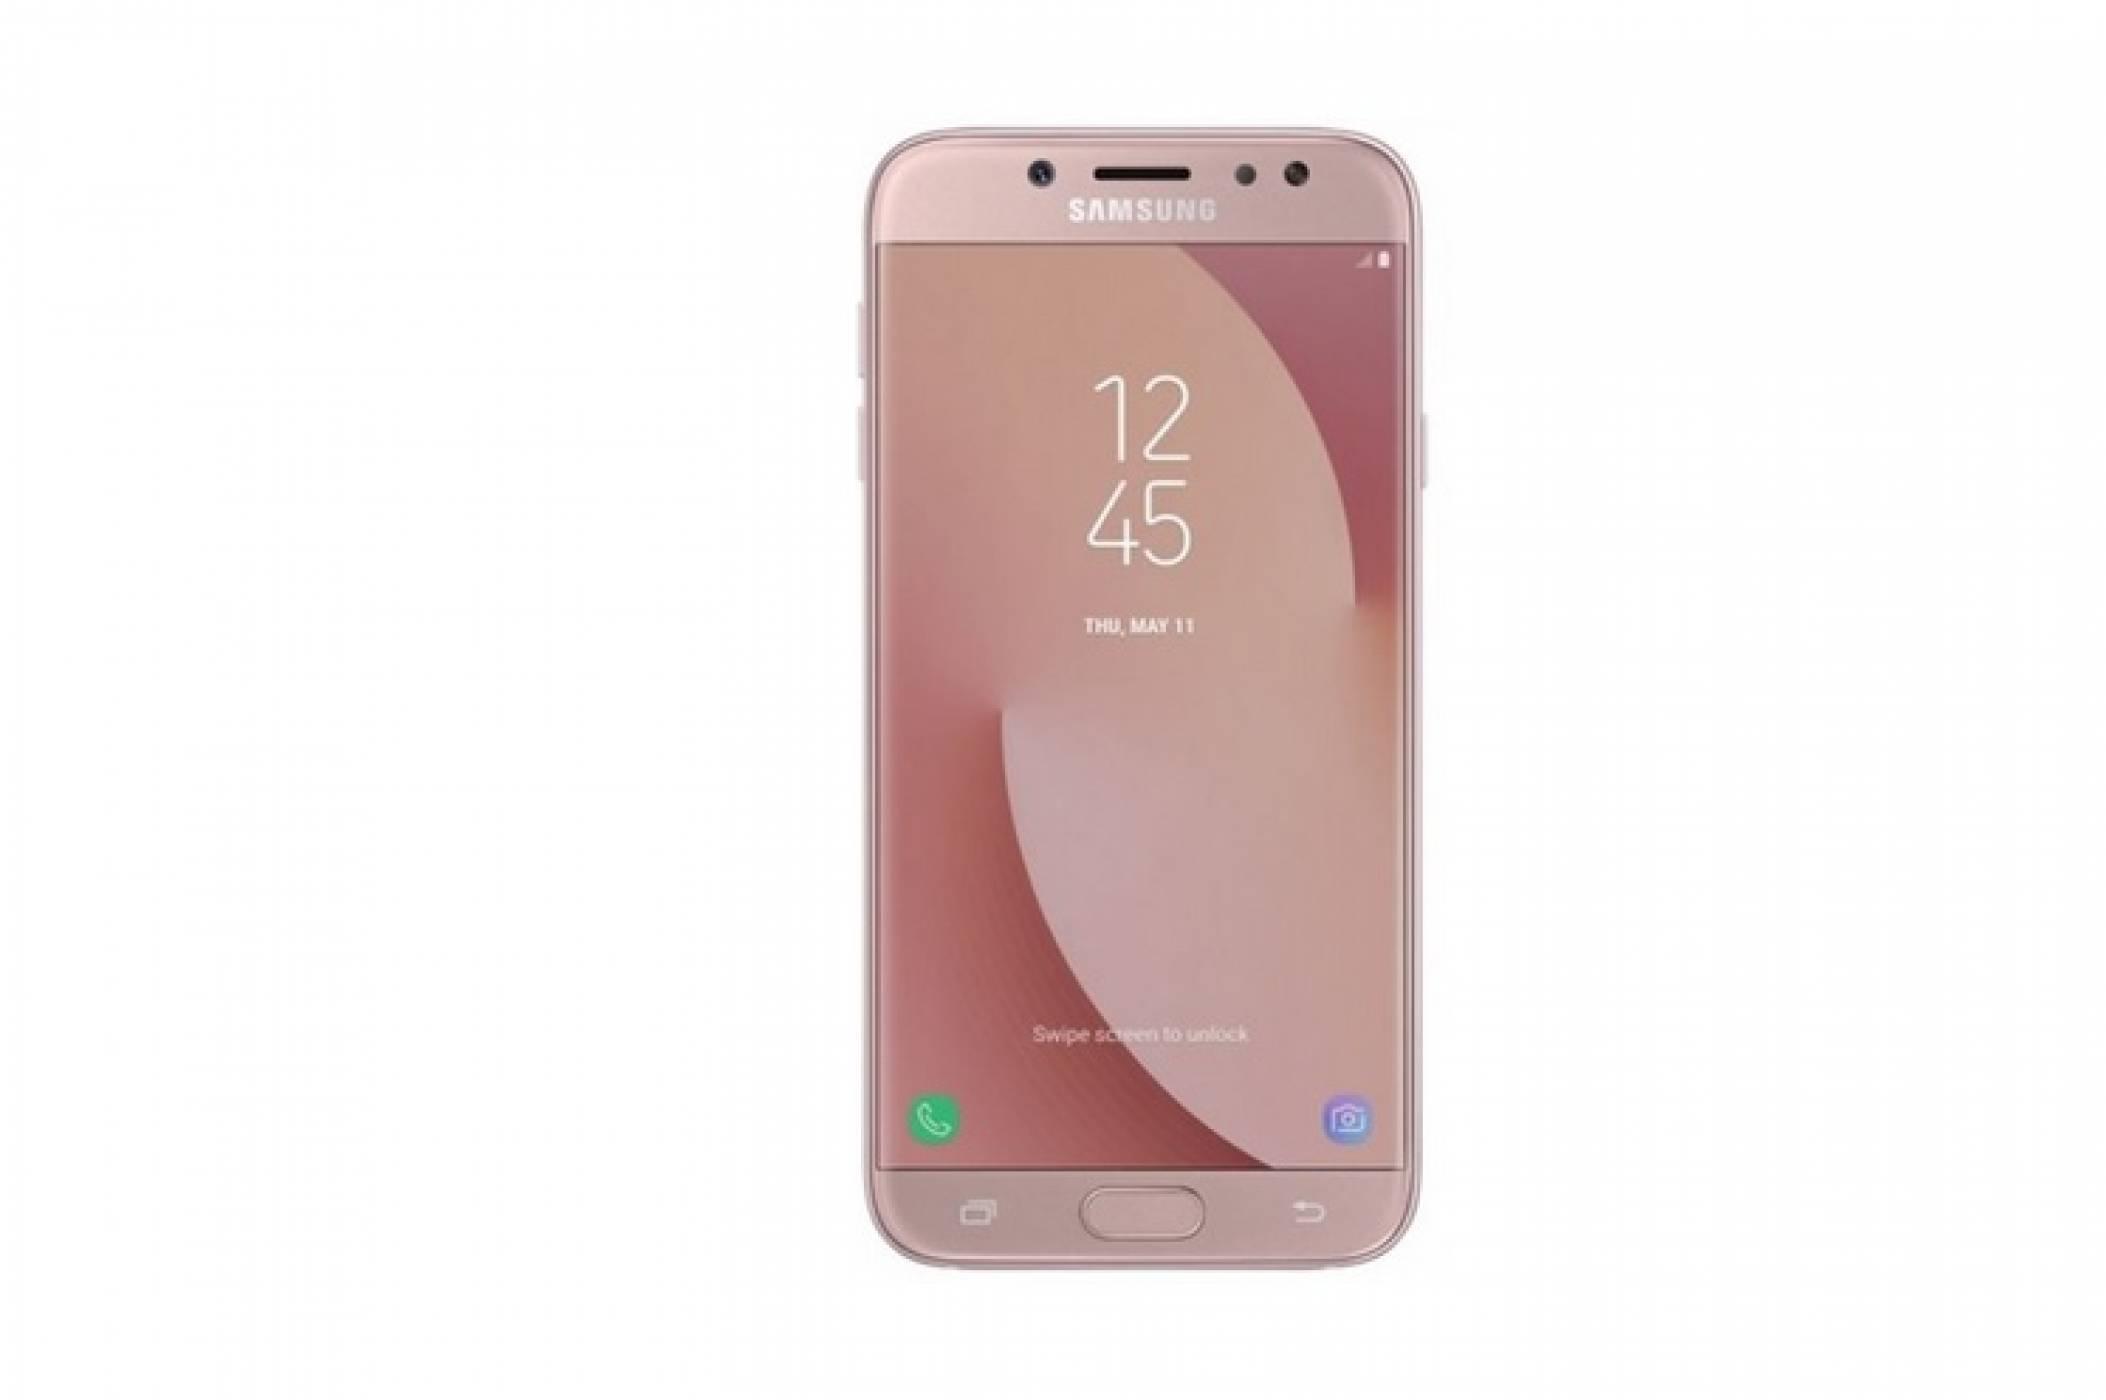 Новият Samsung Galaxy J7 (2017) се появи в обзорно видео